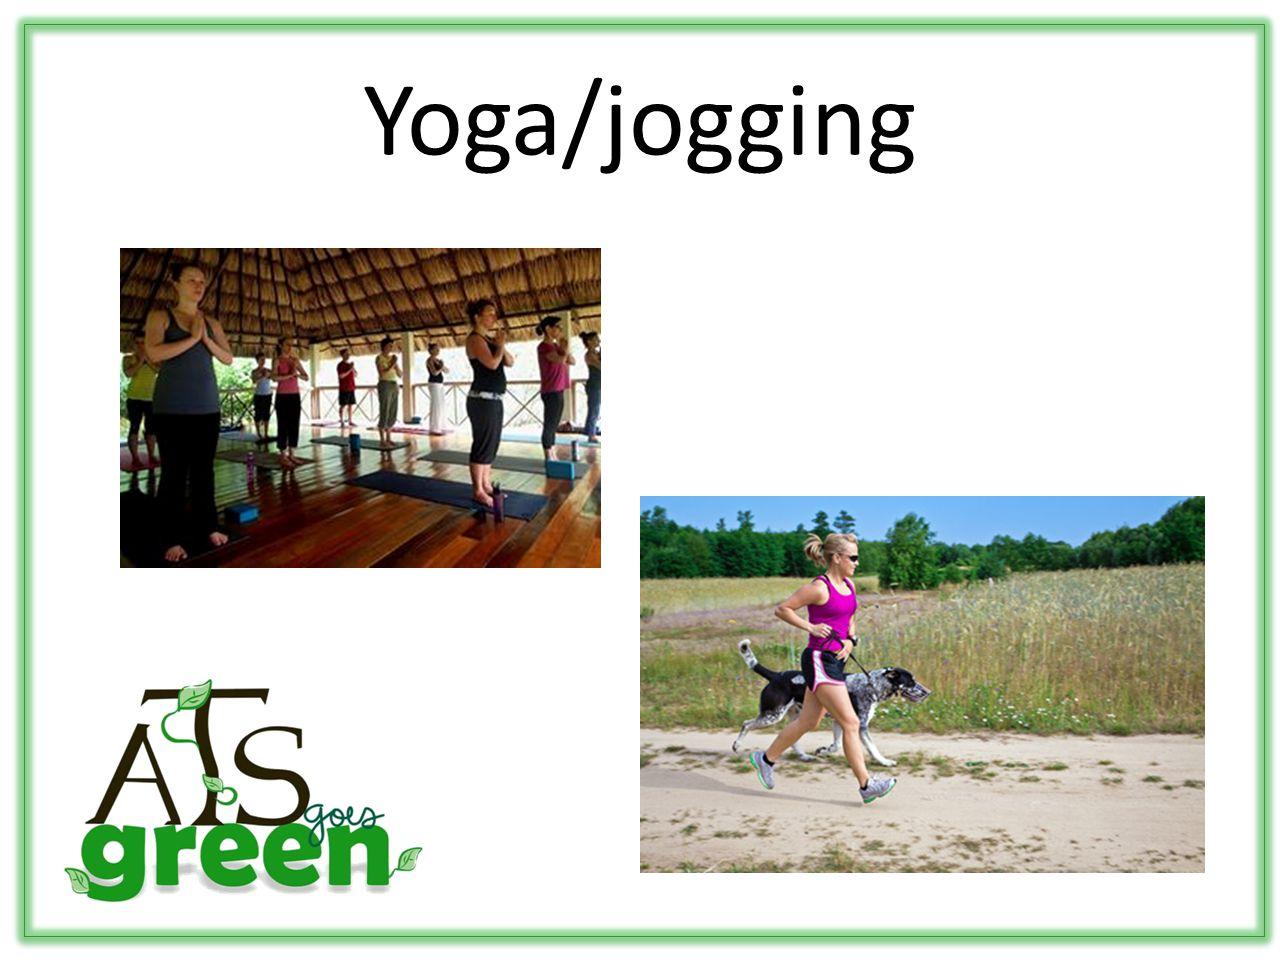 Yoga/jogging